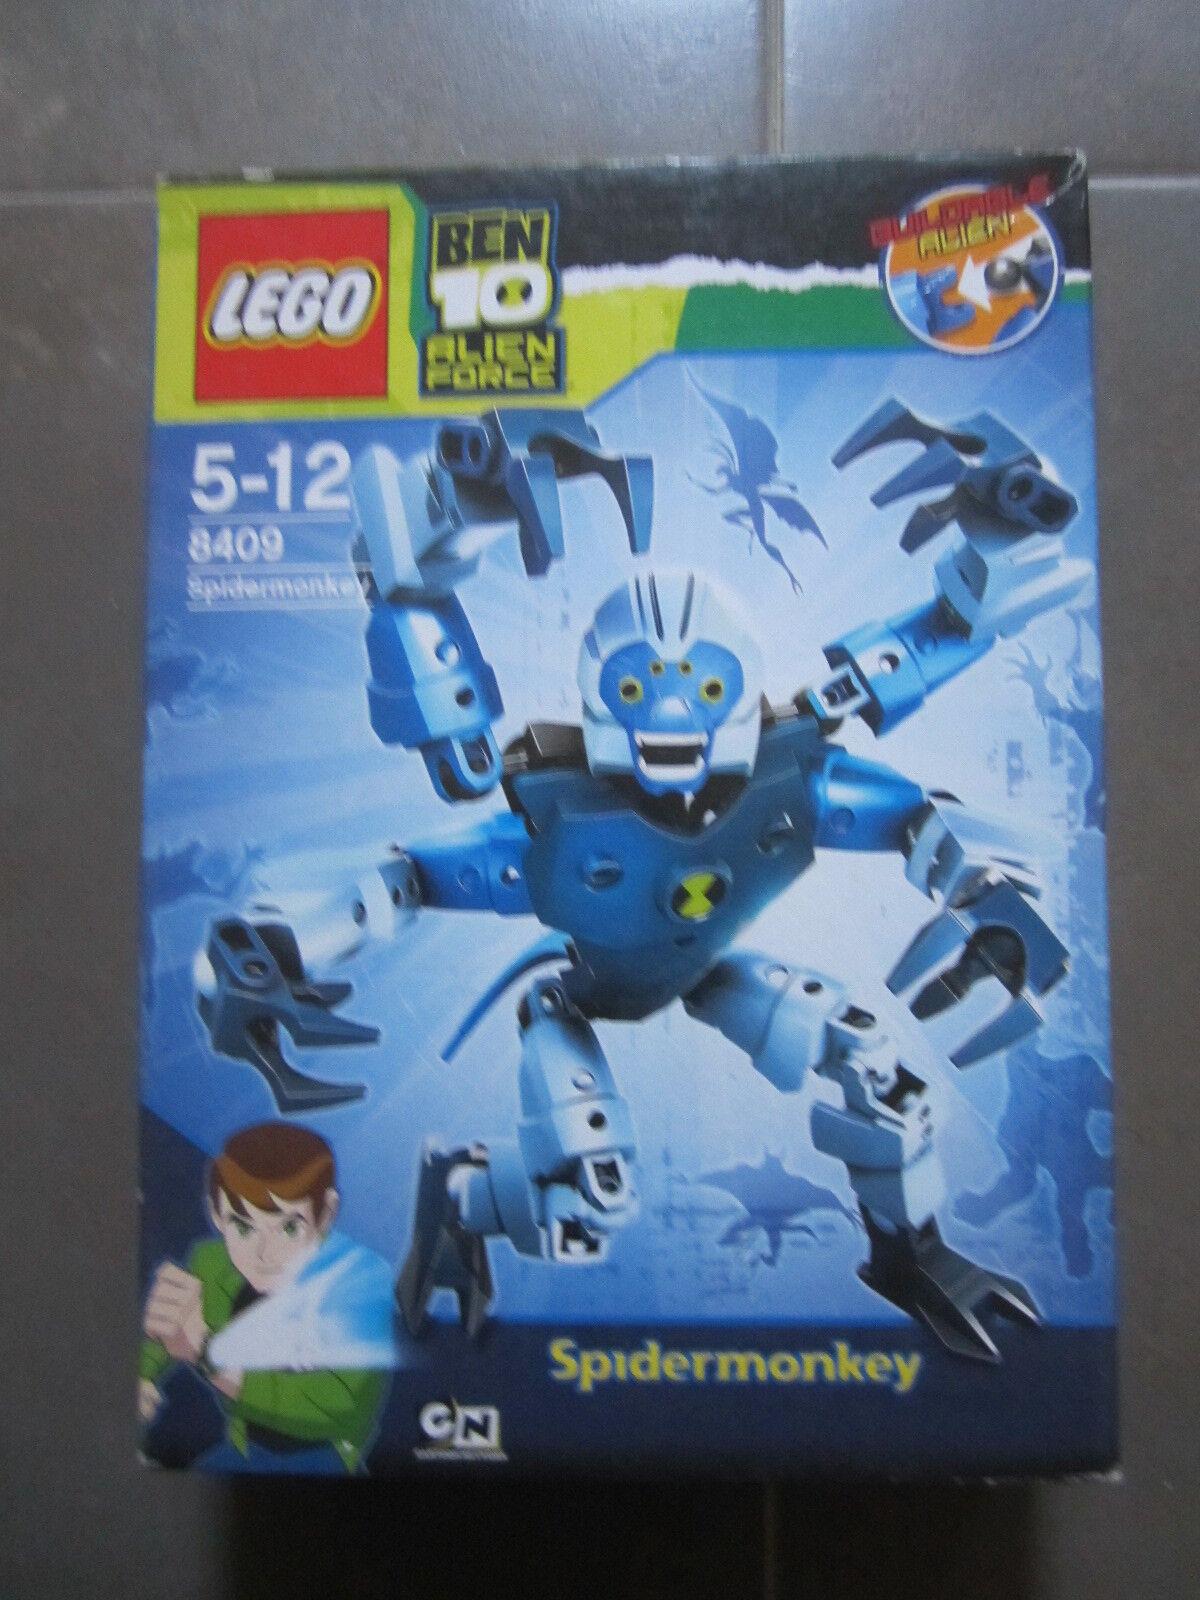 Lego 8409 SPIDER MONKEY Ben 10 Alien. NUEVO EN CAJA SIN ABRIR